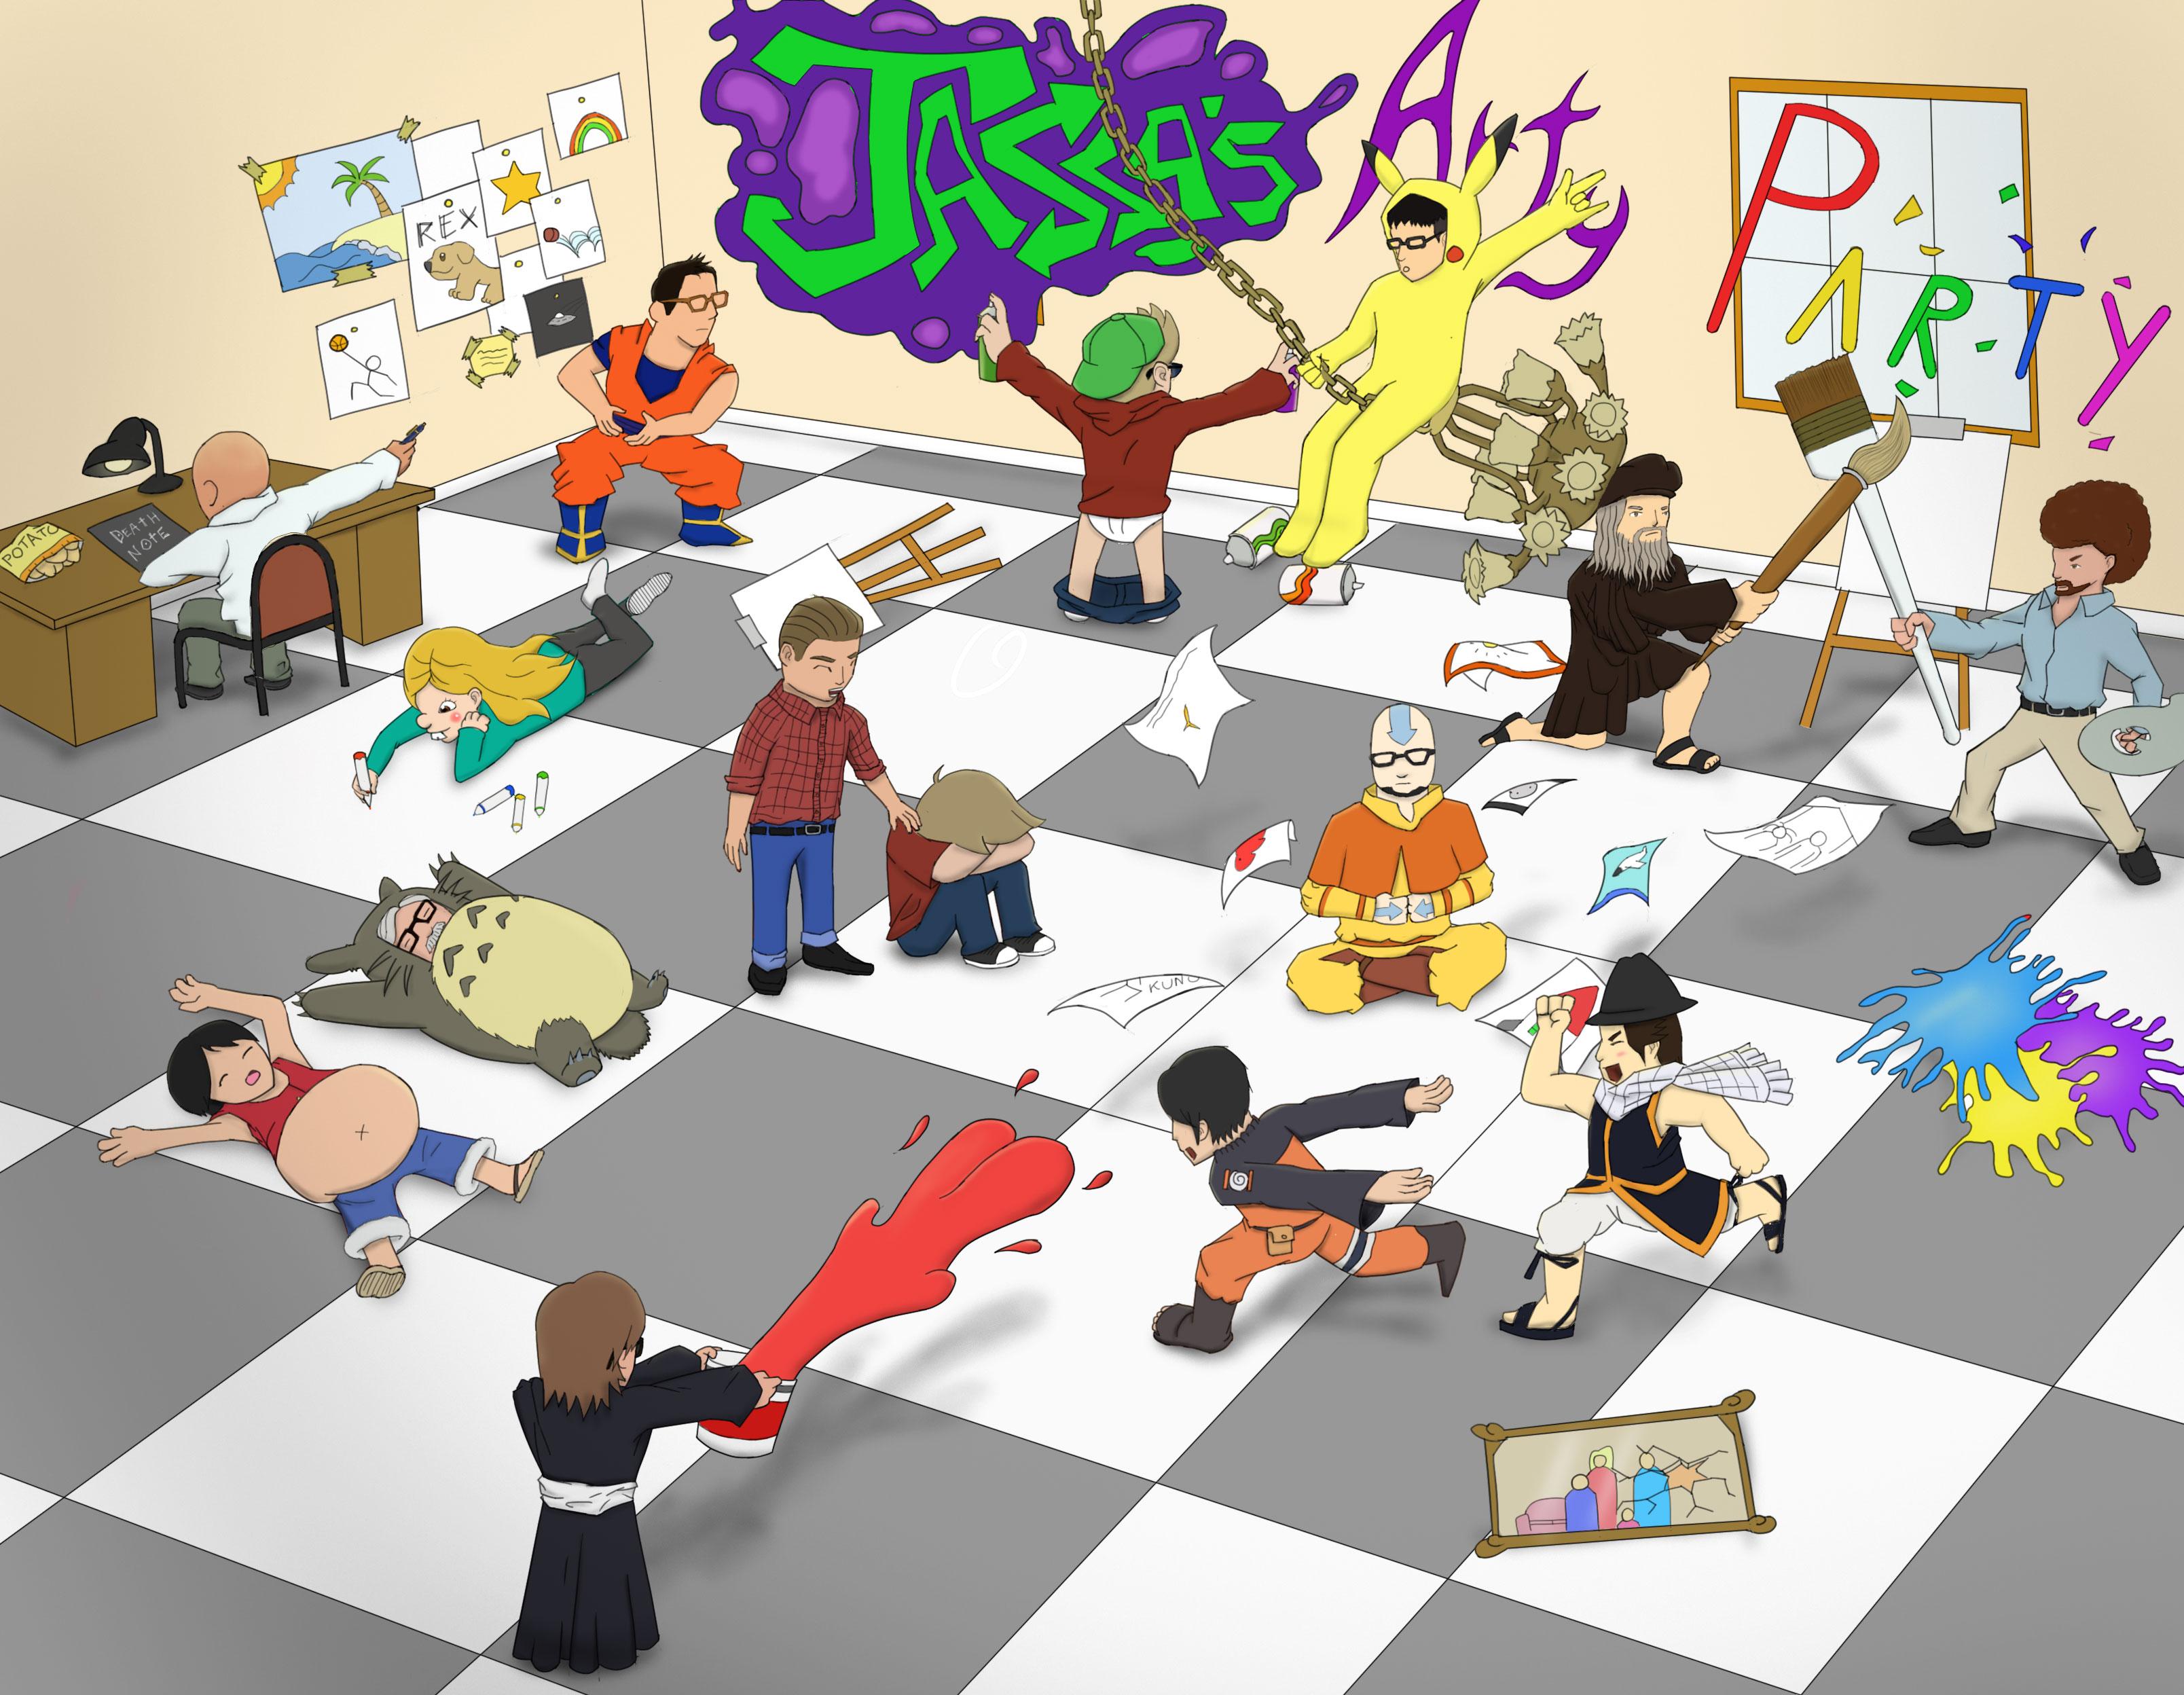 A True Arty Party